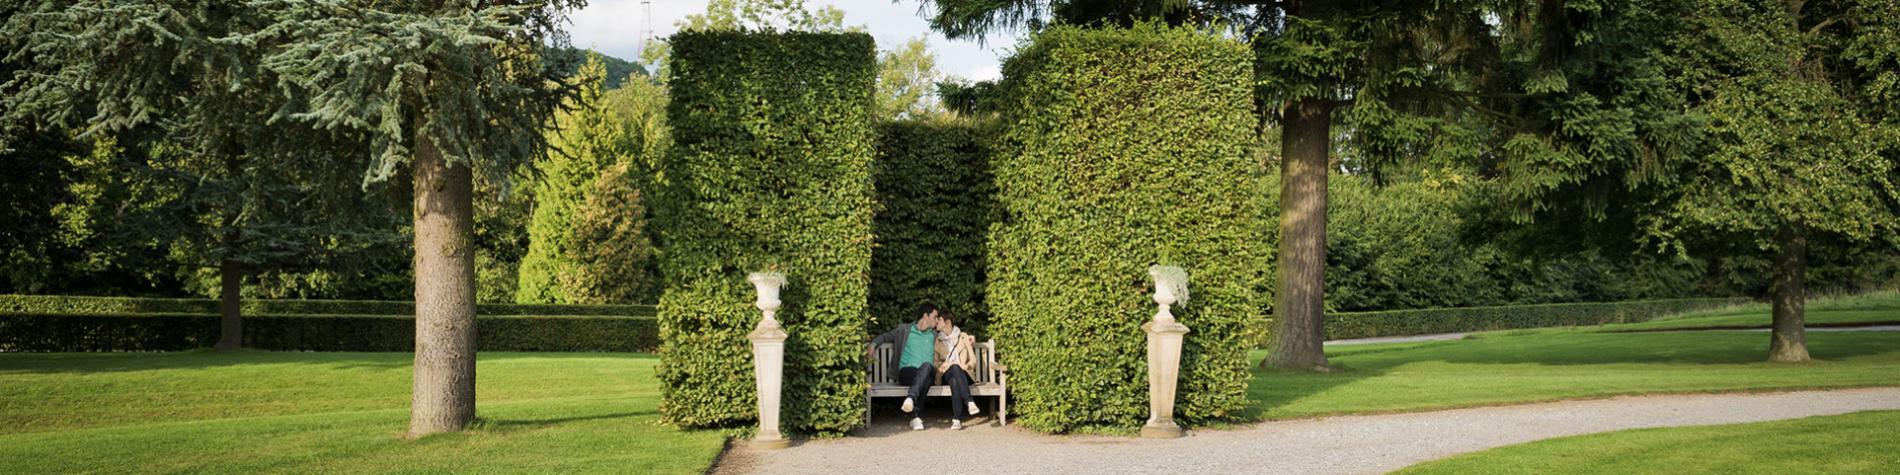 Jardins d'Annevoie - promenade - couple